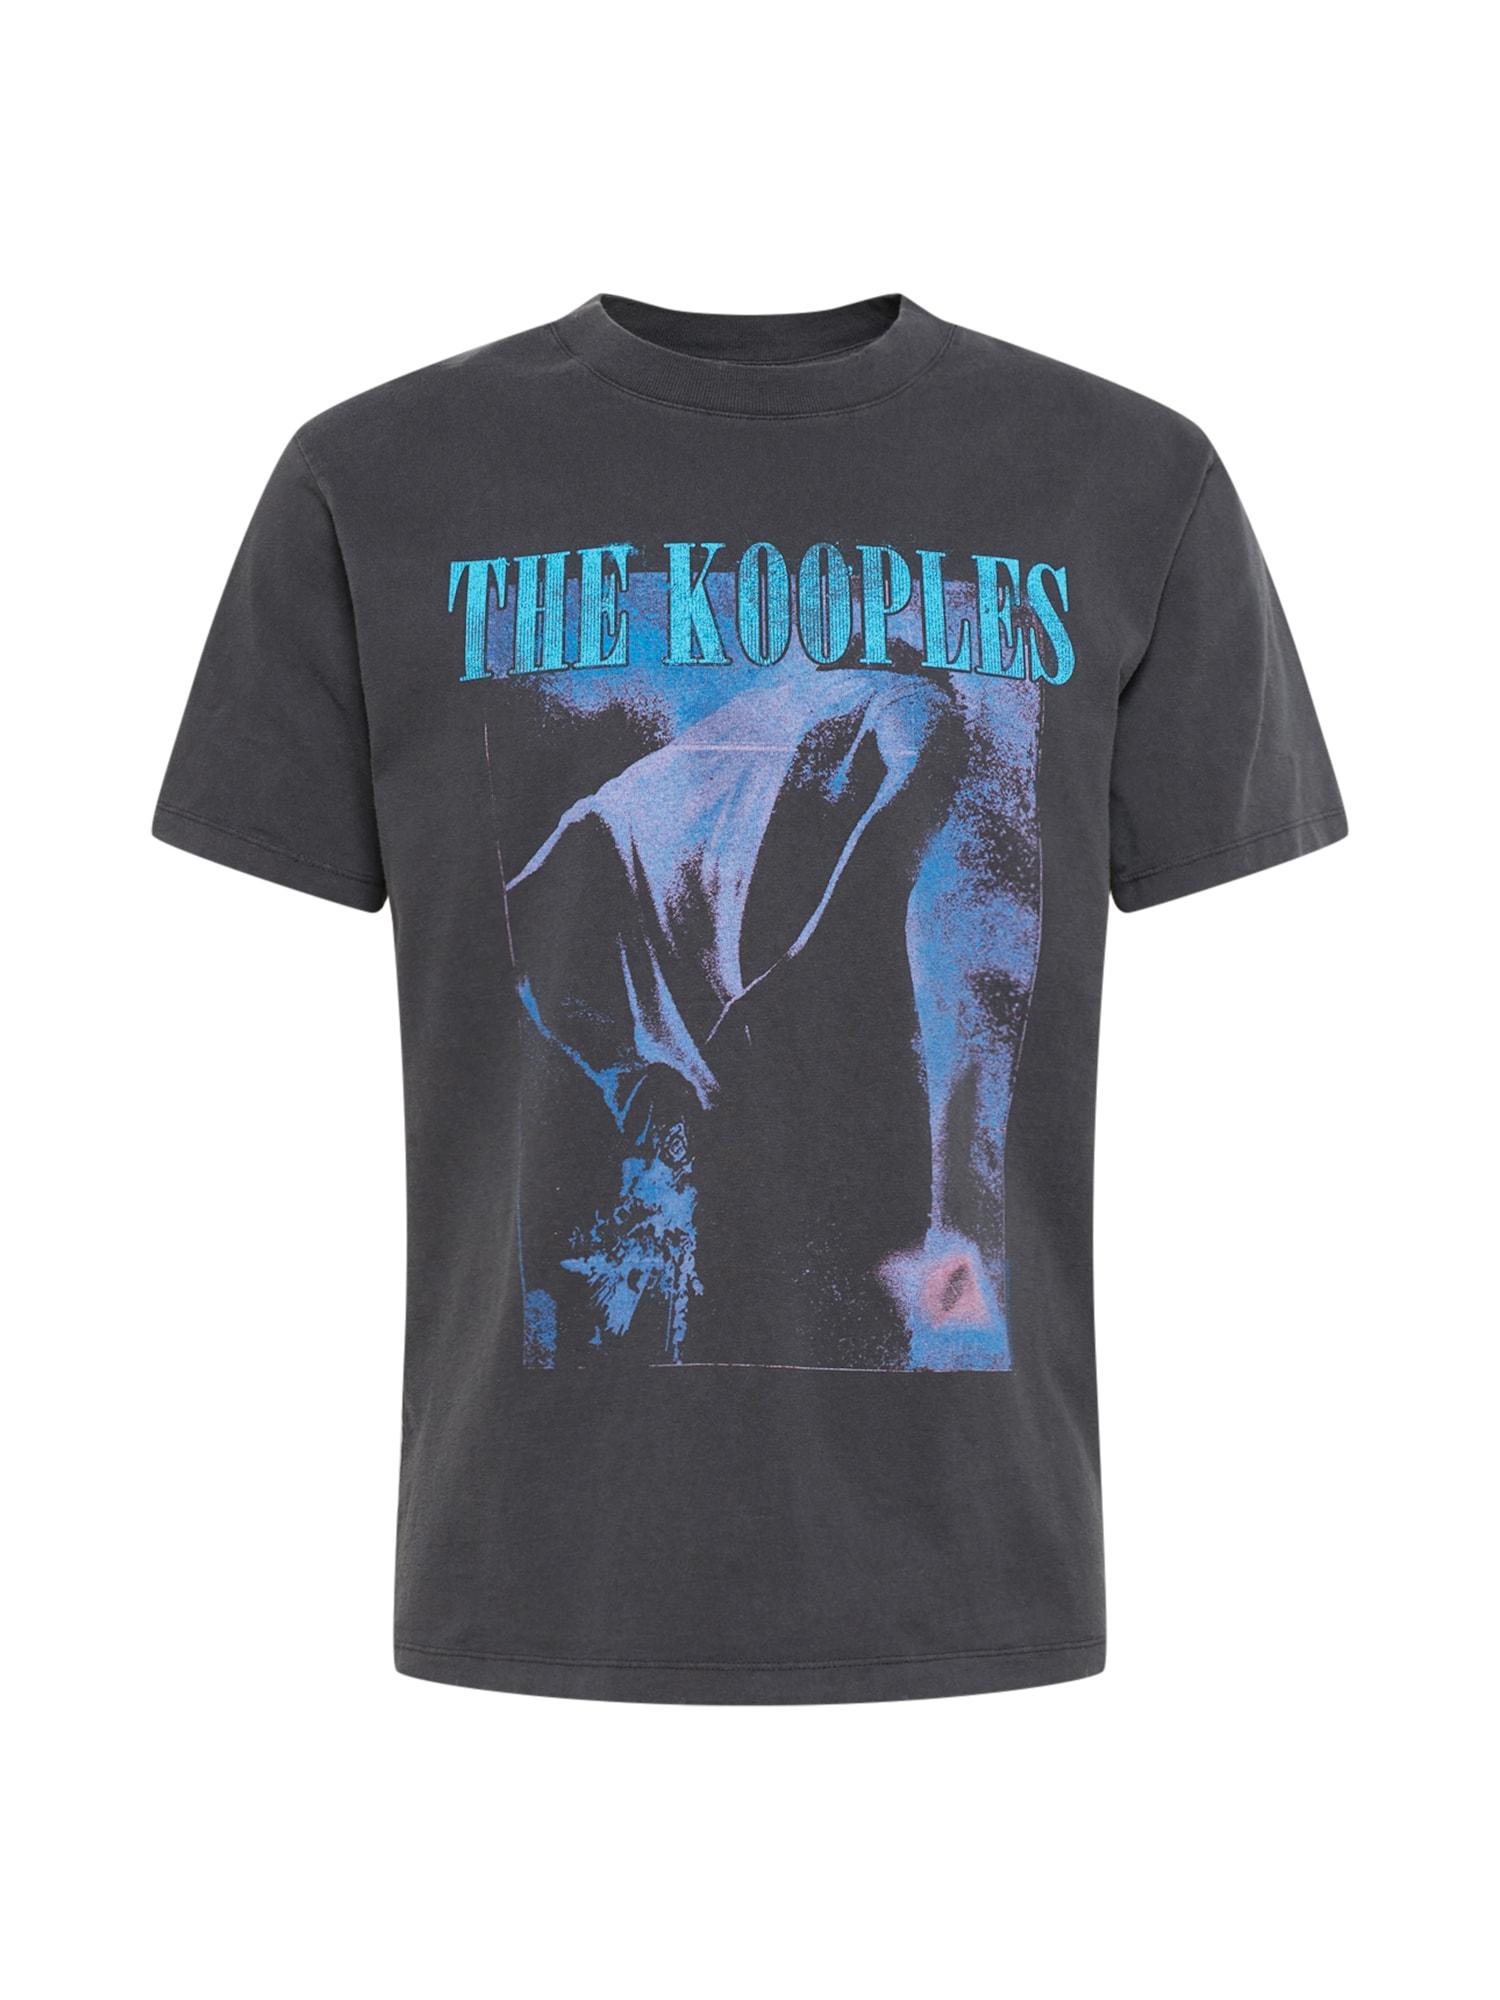 "The Kooples Marškinėliai juoda / turkio spalva / sodri mėlyna (""karališka"")"